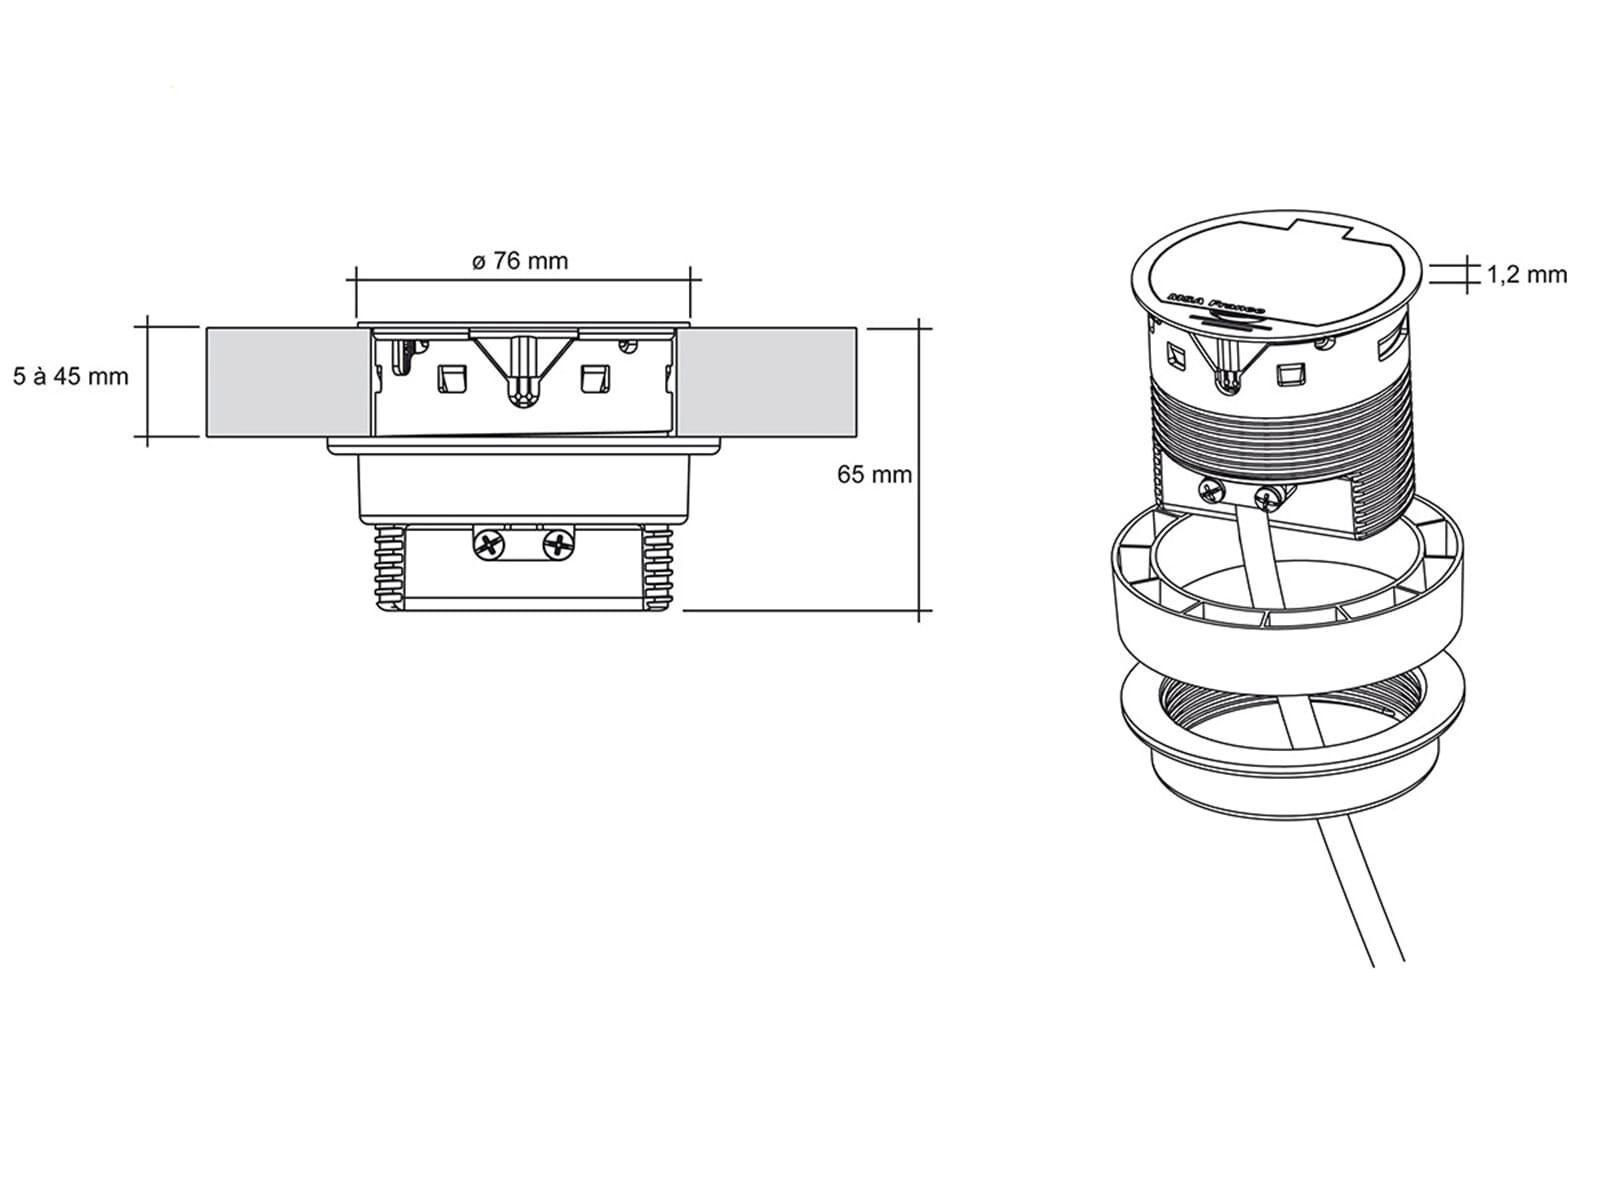 Thebo ST 17 - 17177 Einbau Tischsteckdose Aluminium